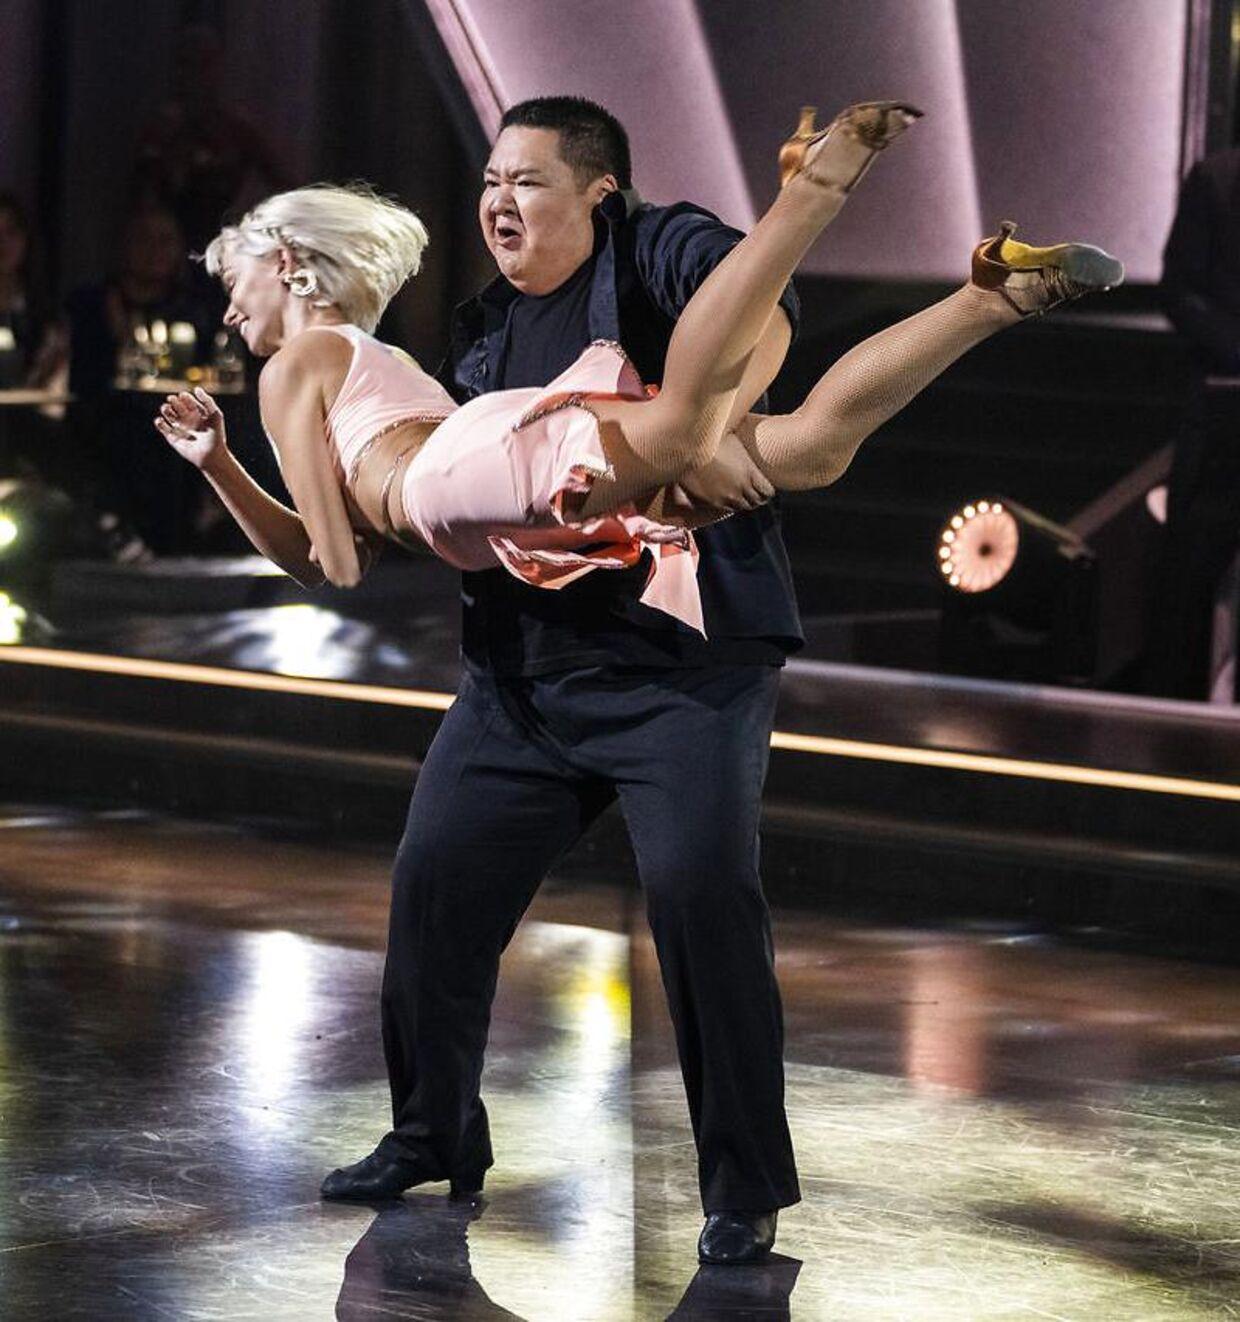 Micki Cheng og Jenna Bagge med det dansetrin, de ynder at kalde 'rullekebabben'.